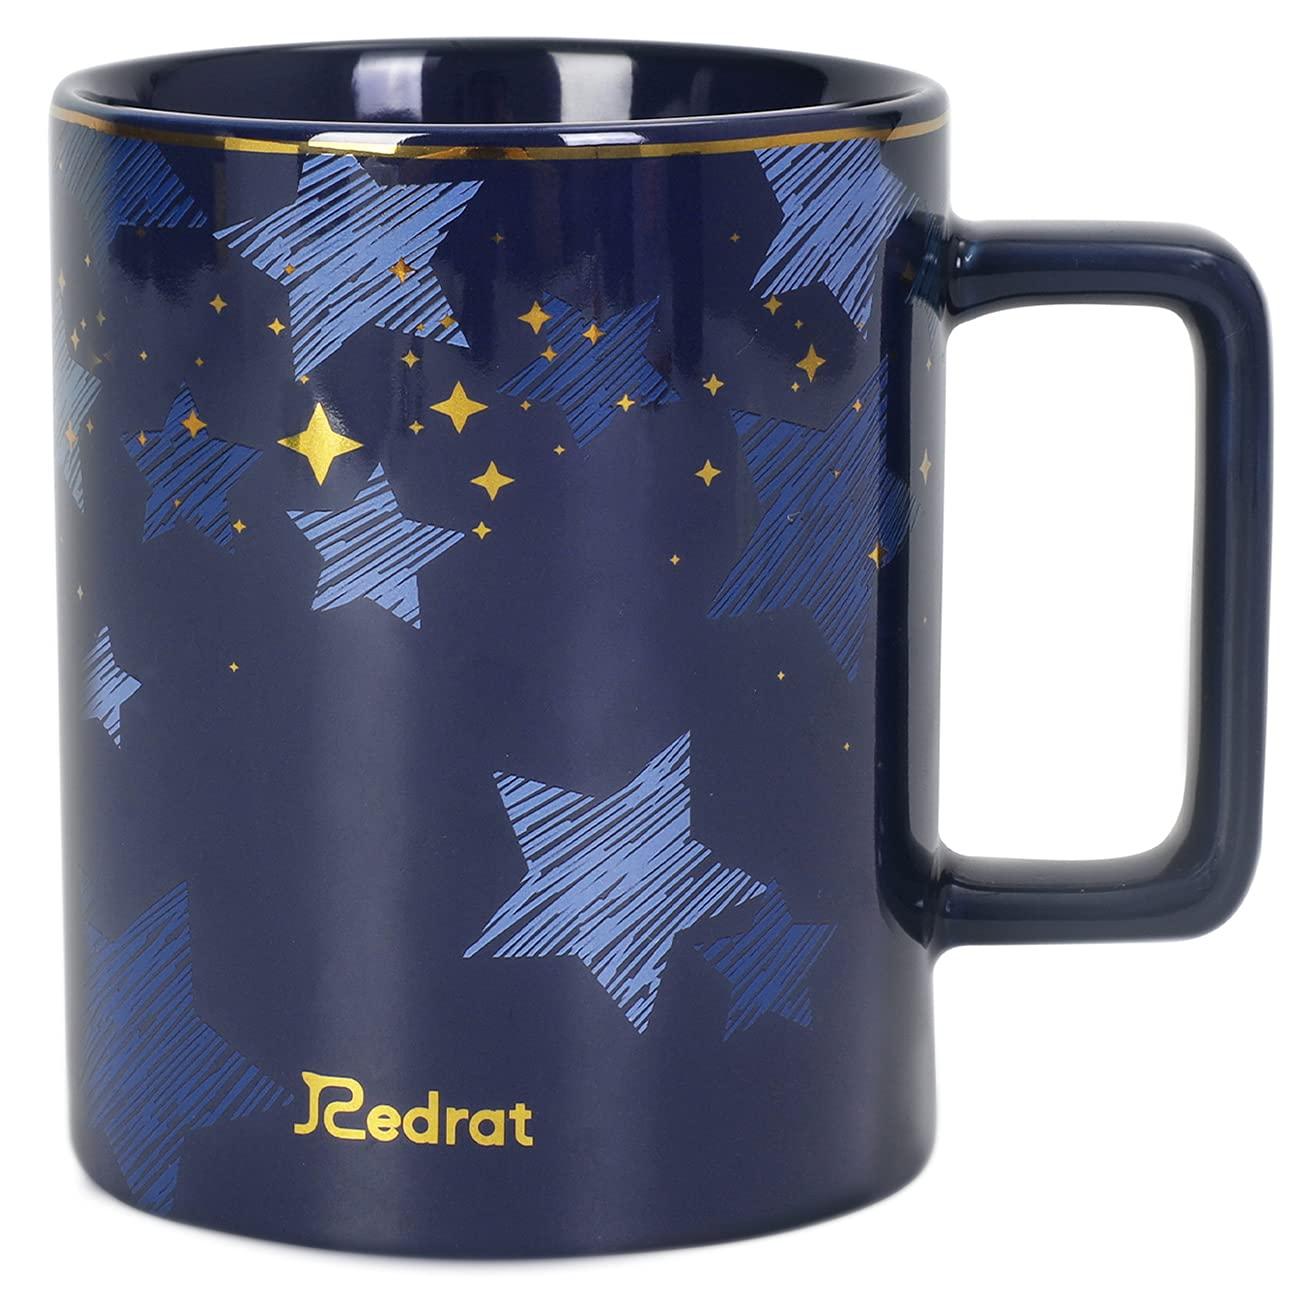 Redrat Coffee Mug Tea Inexpensive In stock Friendship Cup Cups Ceramic